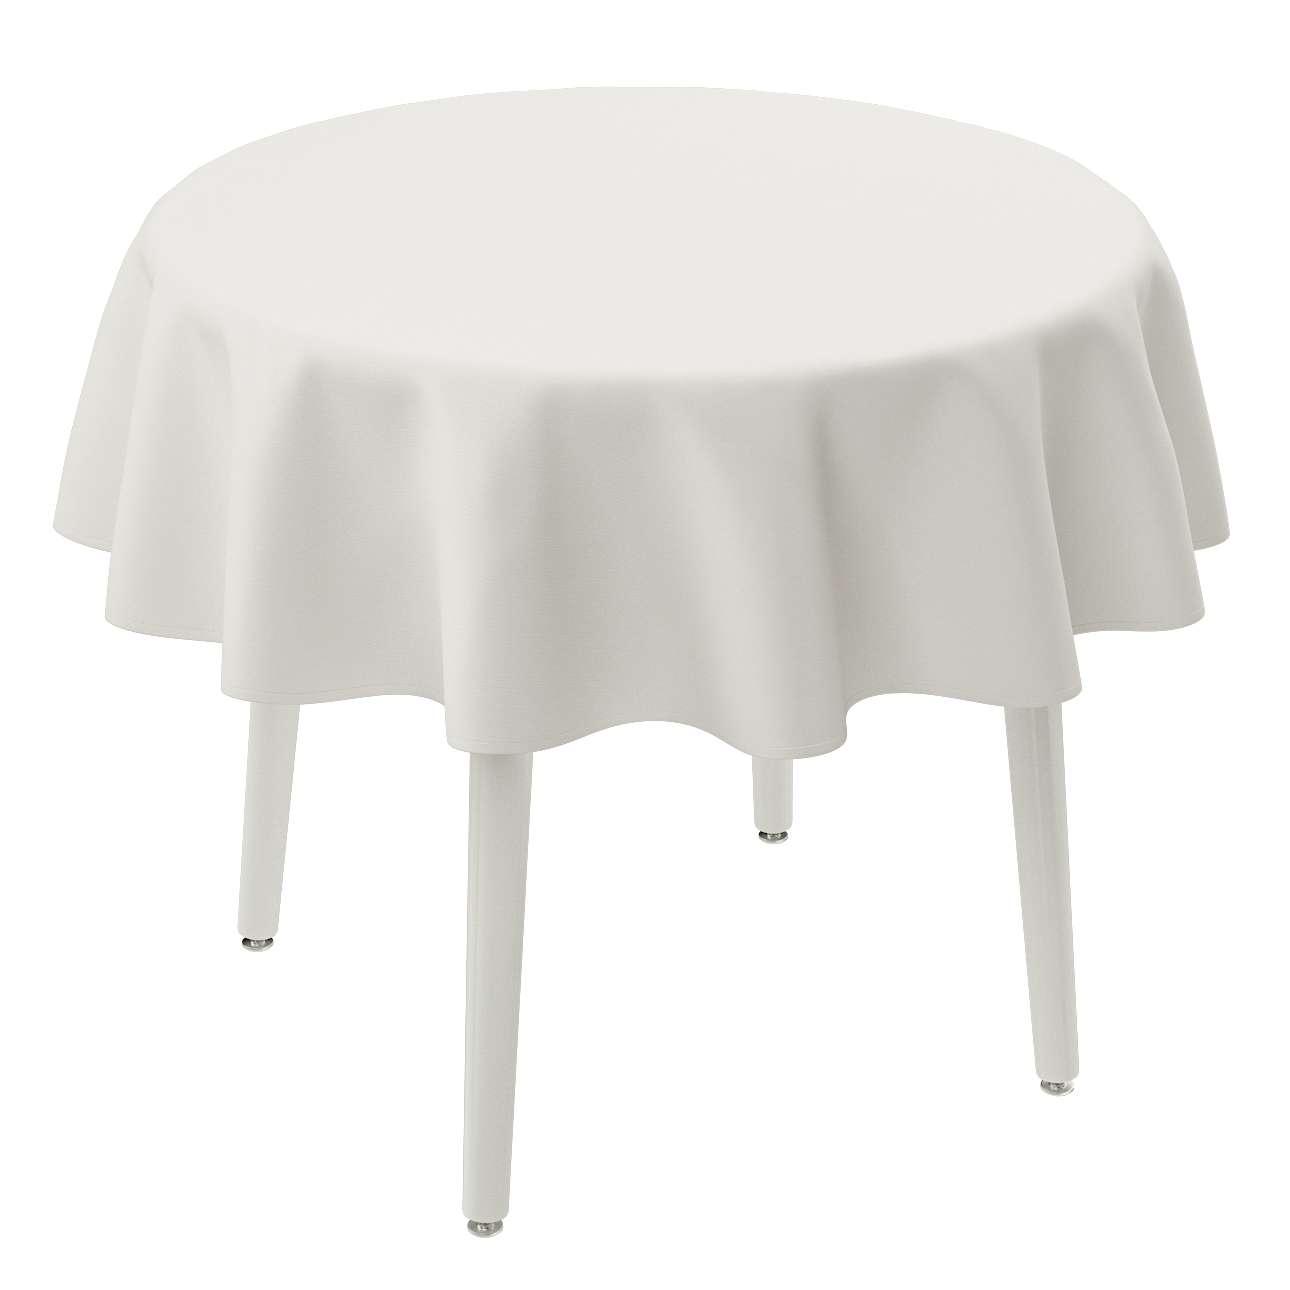 Rund bordsduk i kollektionen Panama Cotton, Tyg: 702-34